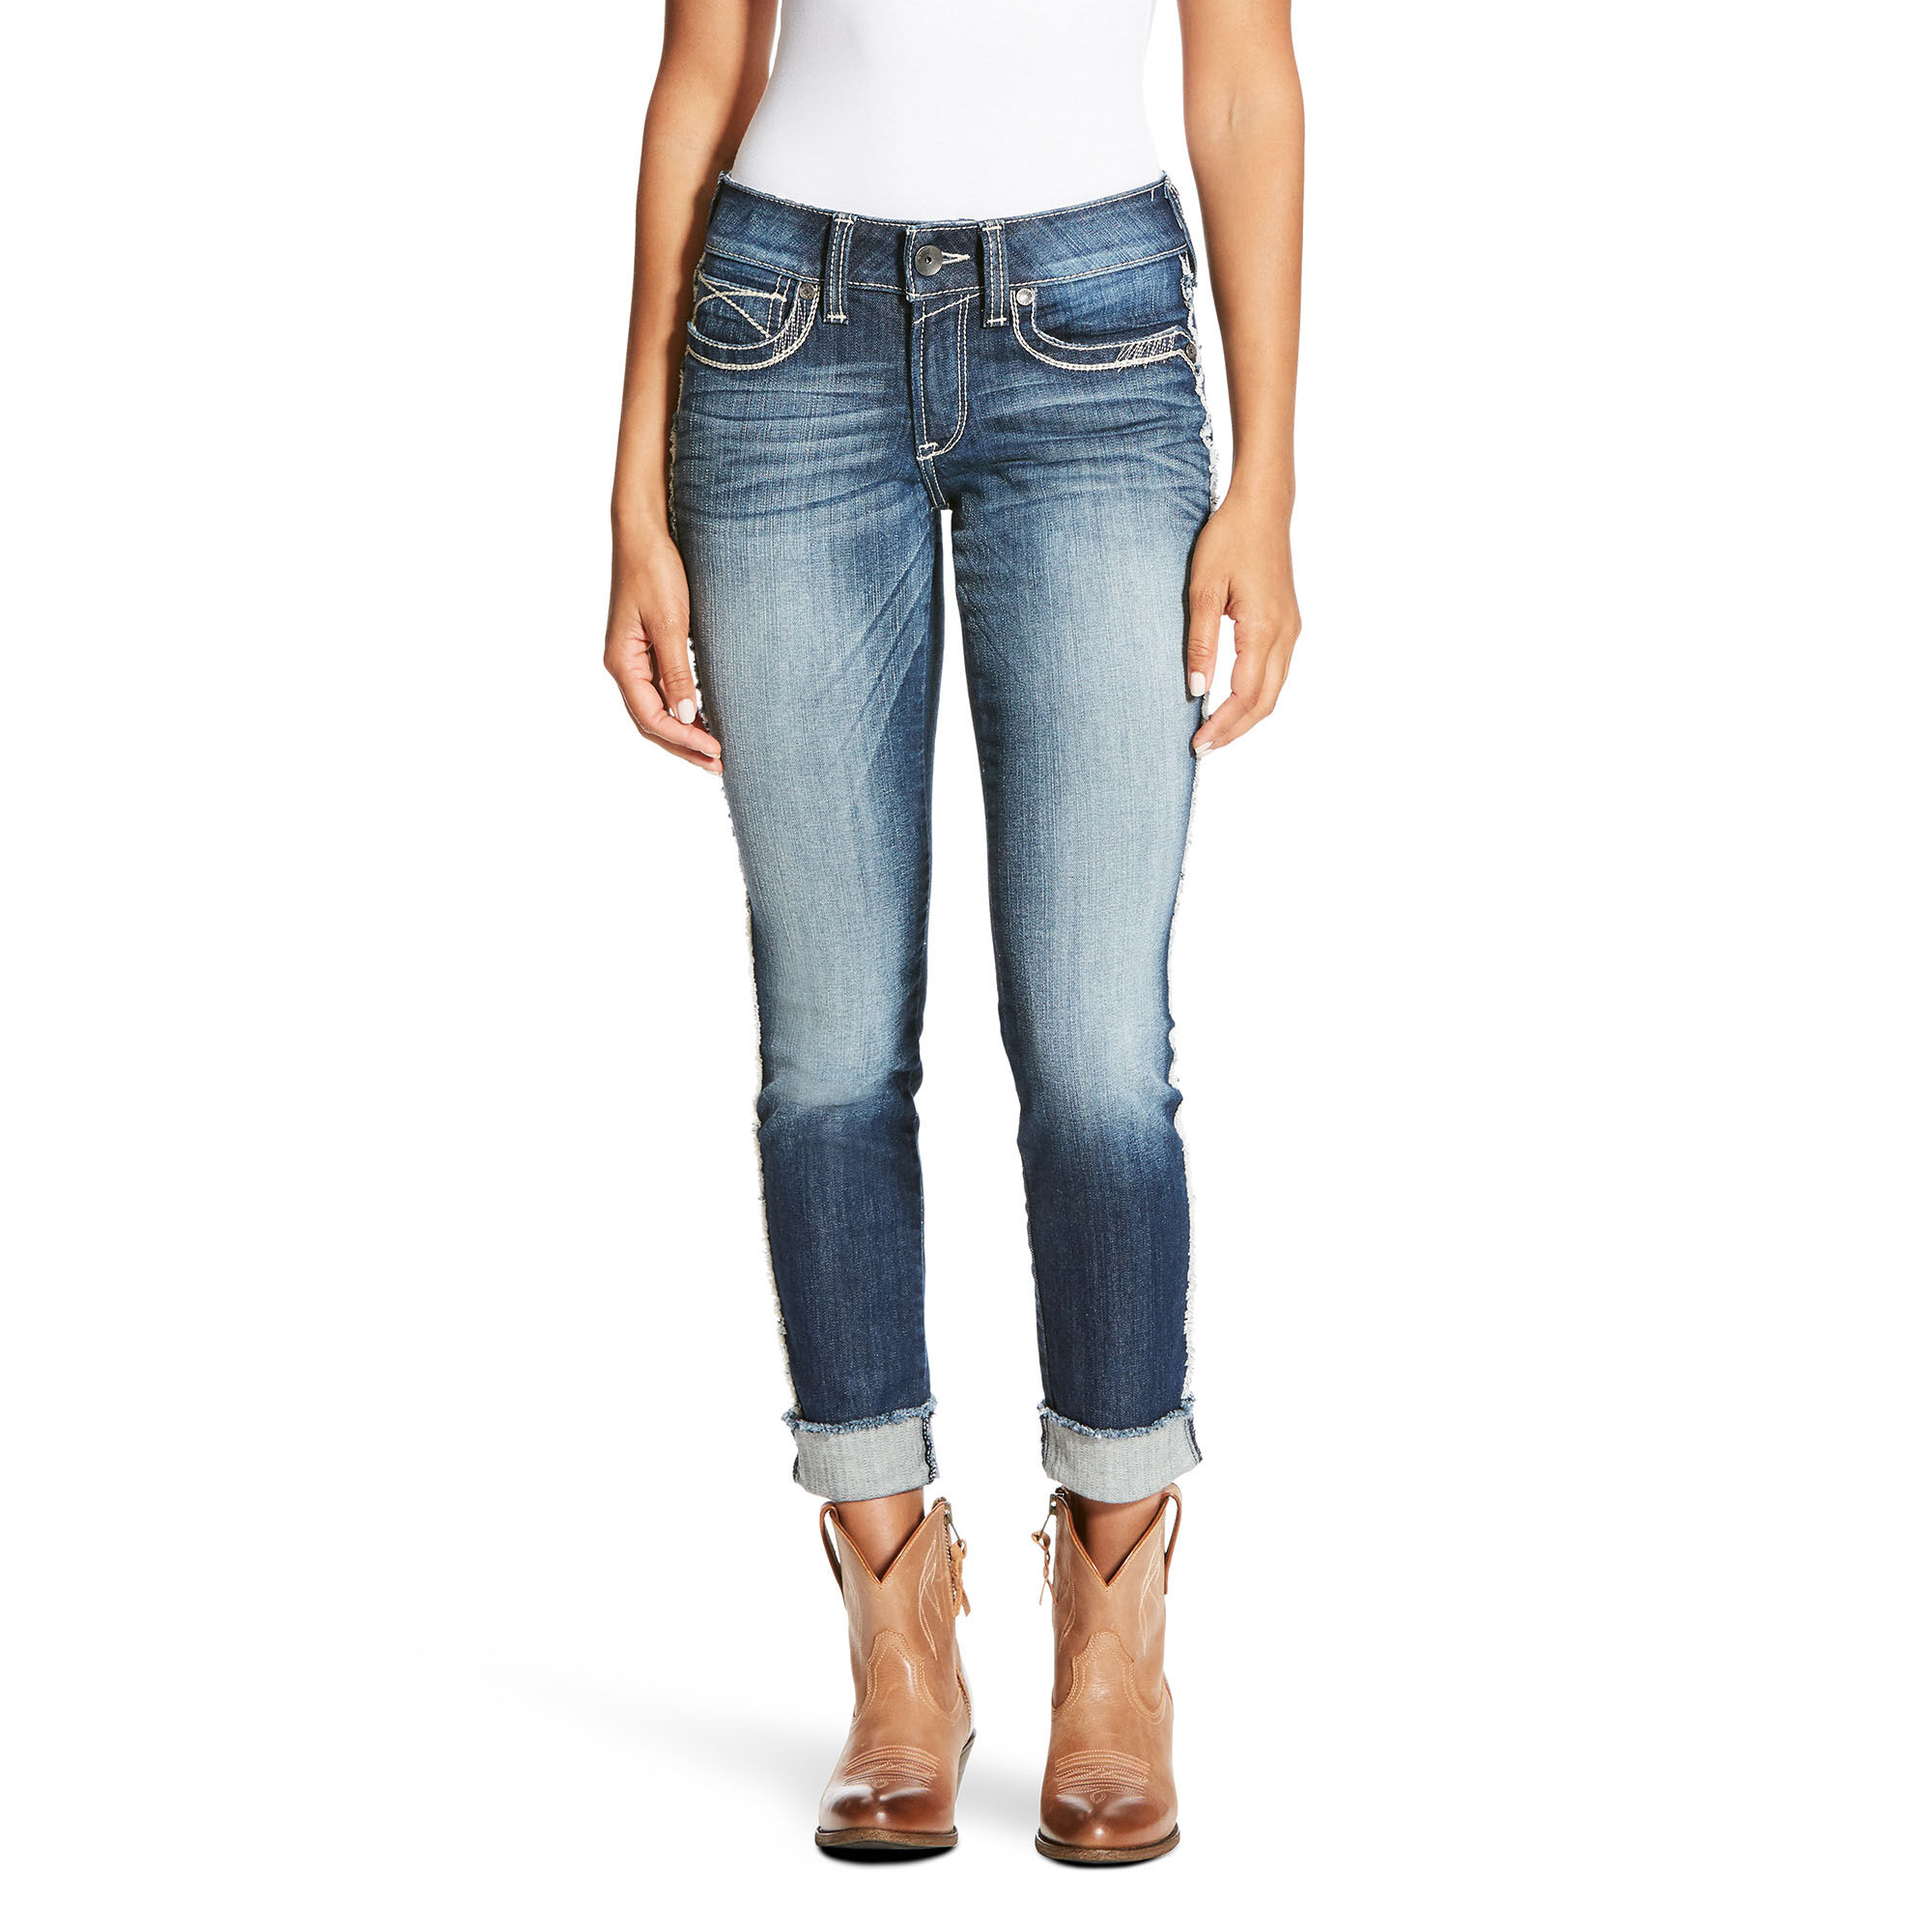 R.E.A.L Mid Rise Side Seam Fray Skinny Jean